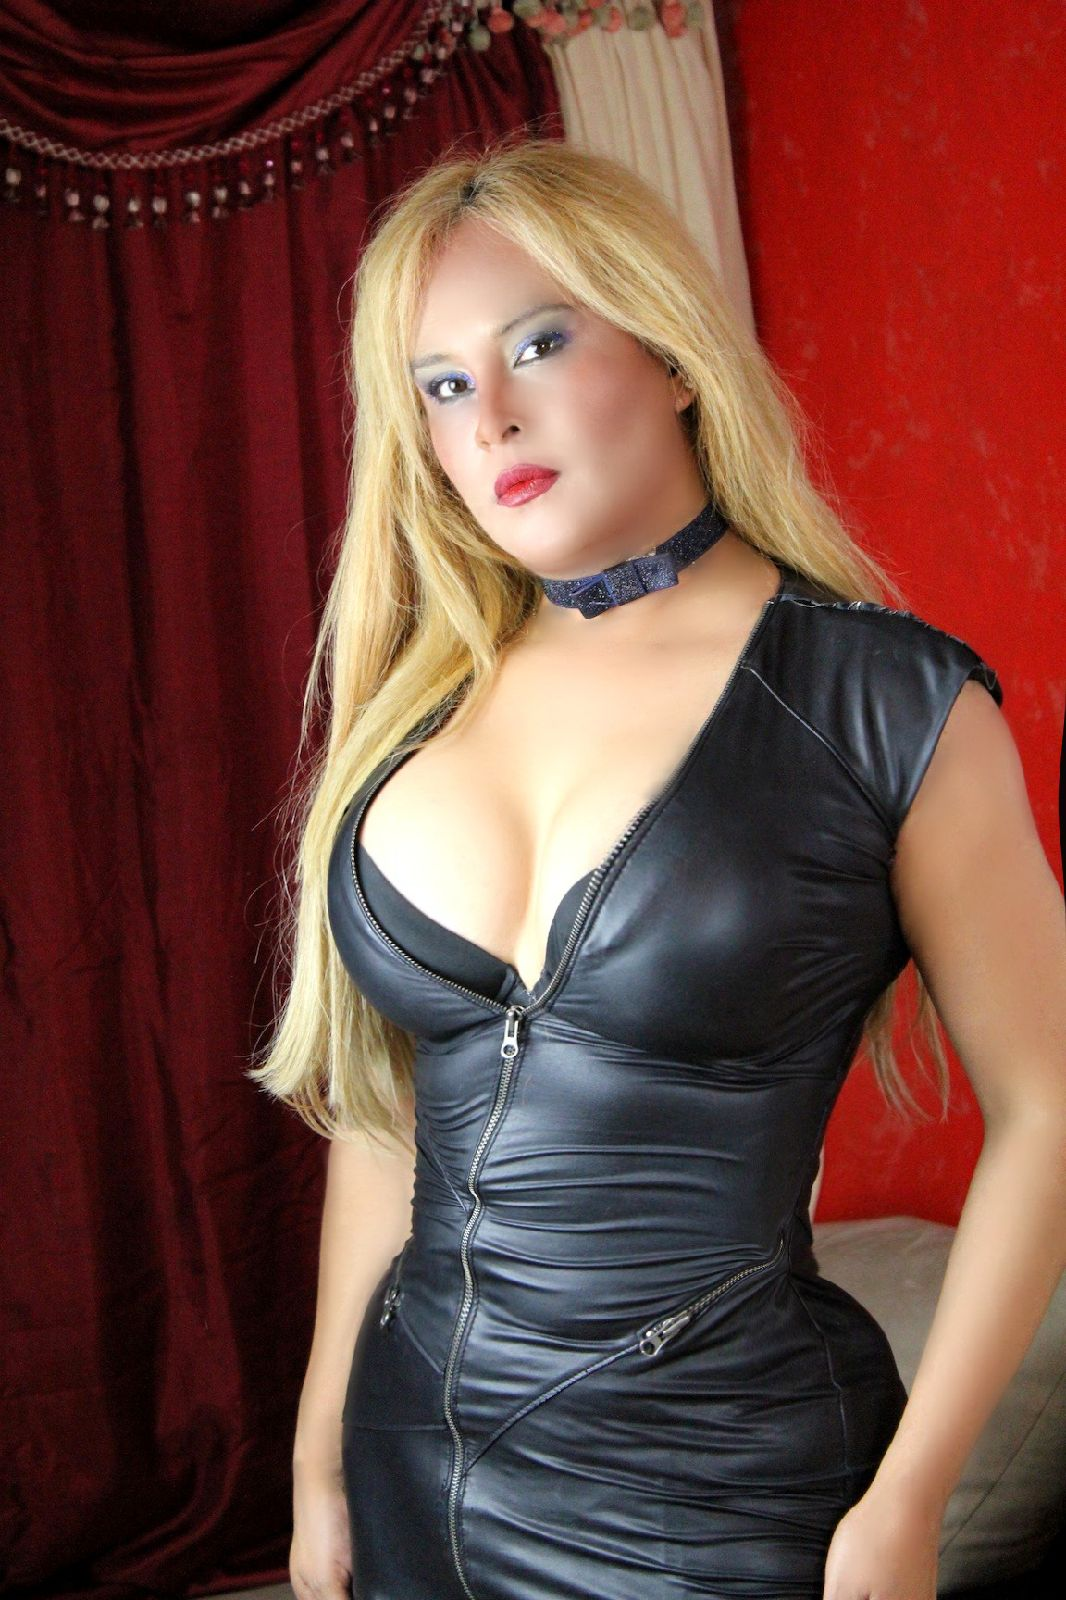 MISTRESS MARINNA Profile, Escort in San Francisco, 3238474435